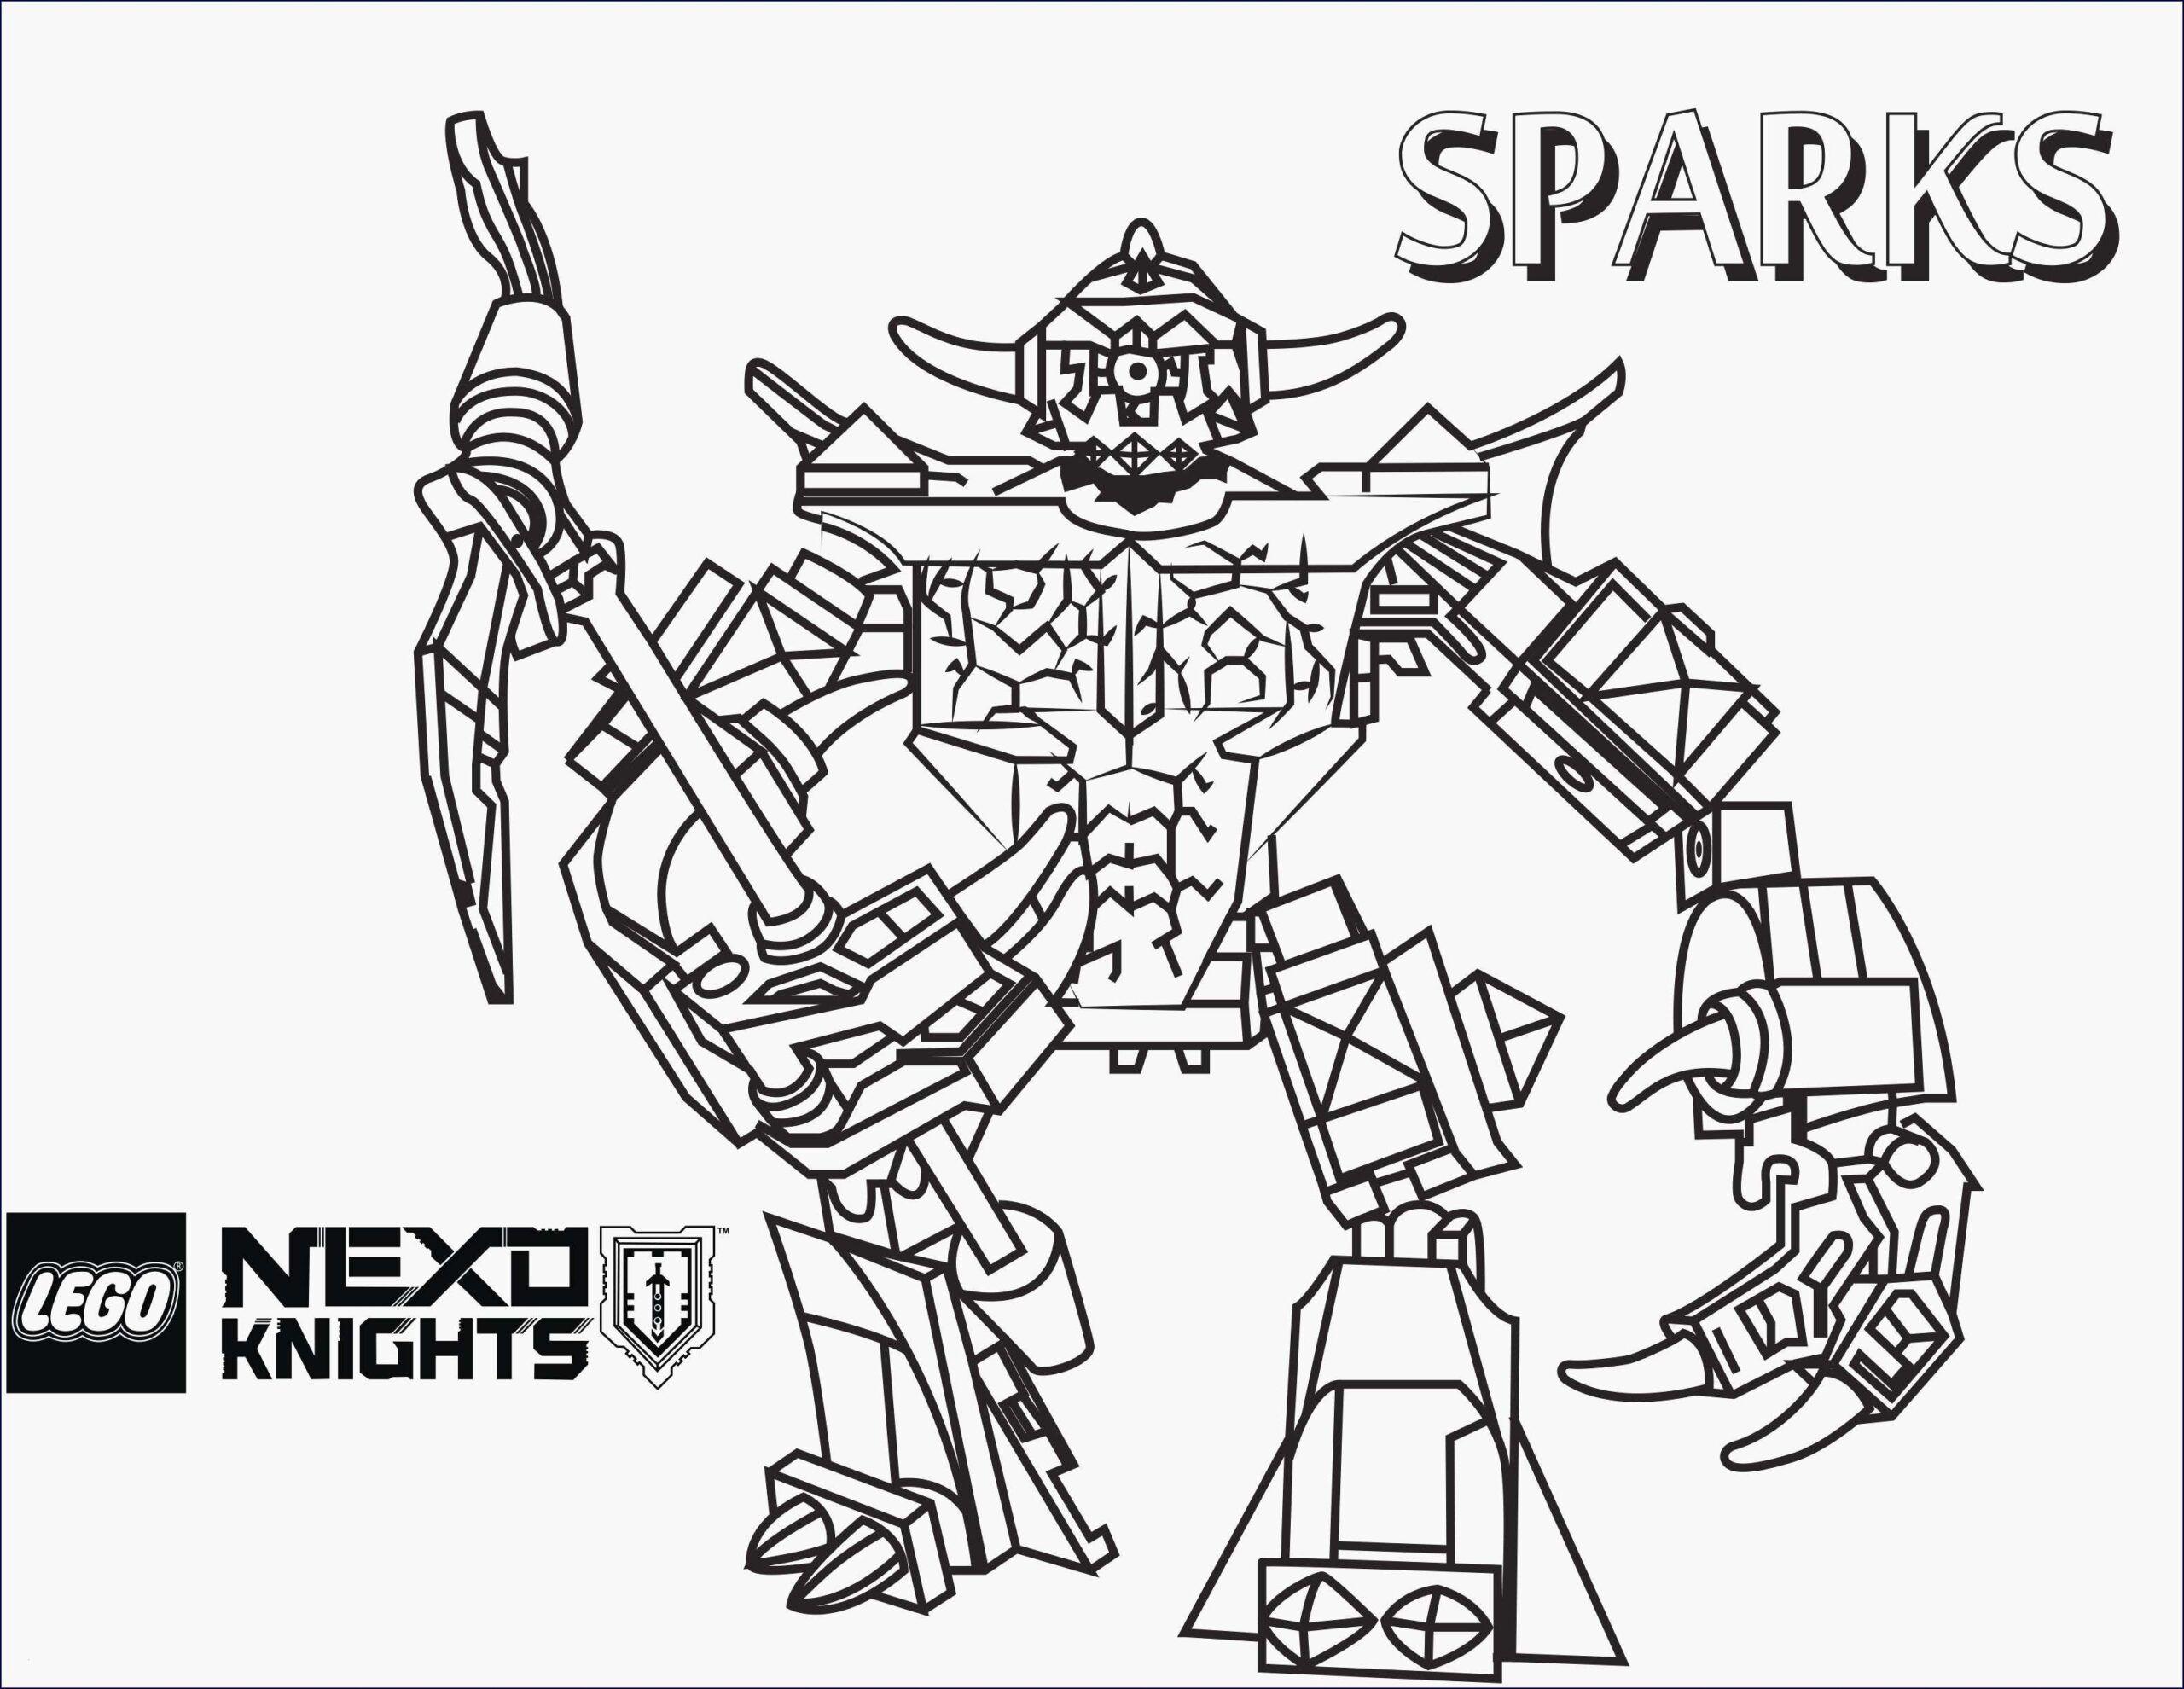 Ten Gut Lego Ninjago Malvorlage Gedanke 2020 Malvorlagen